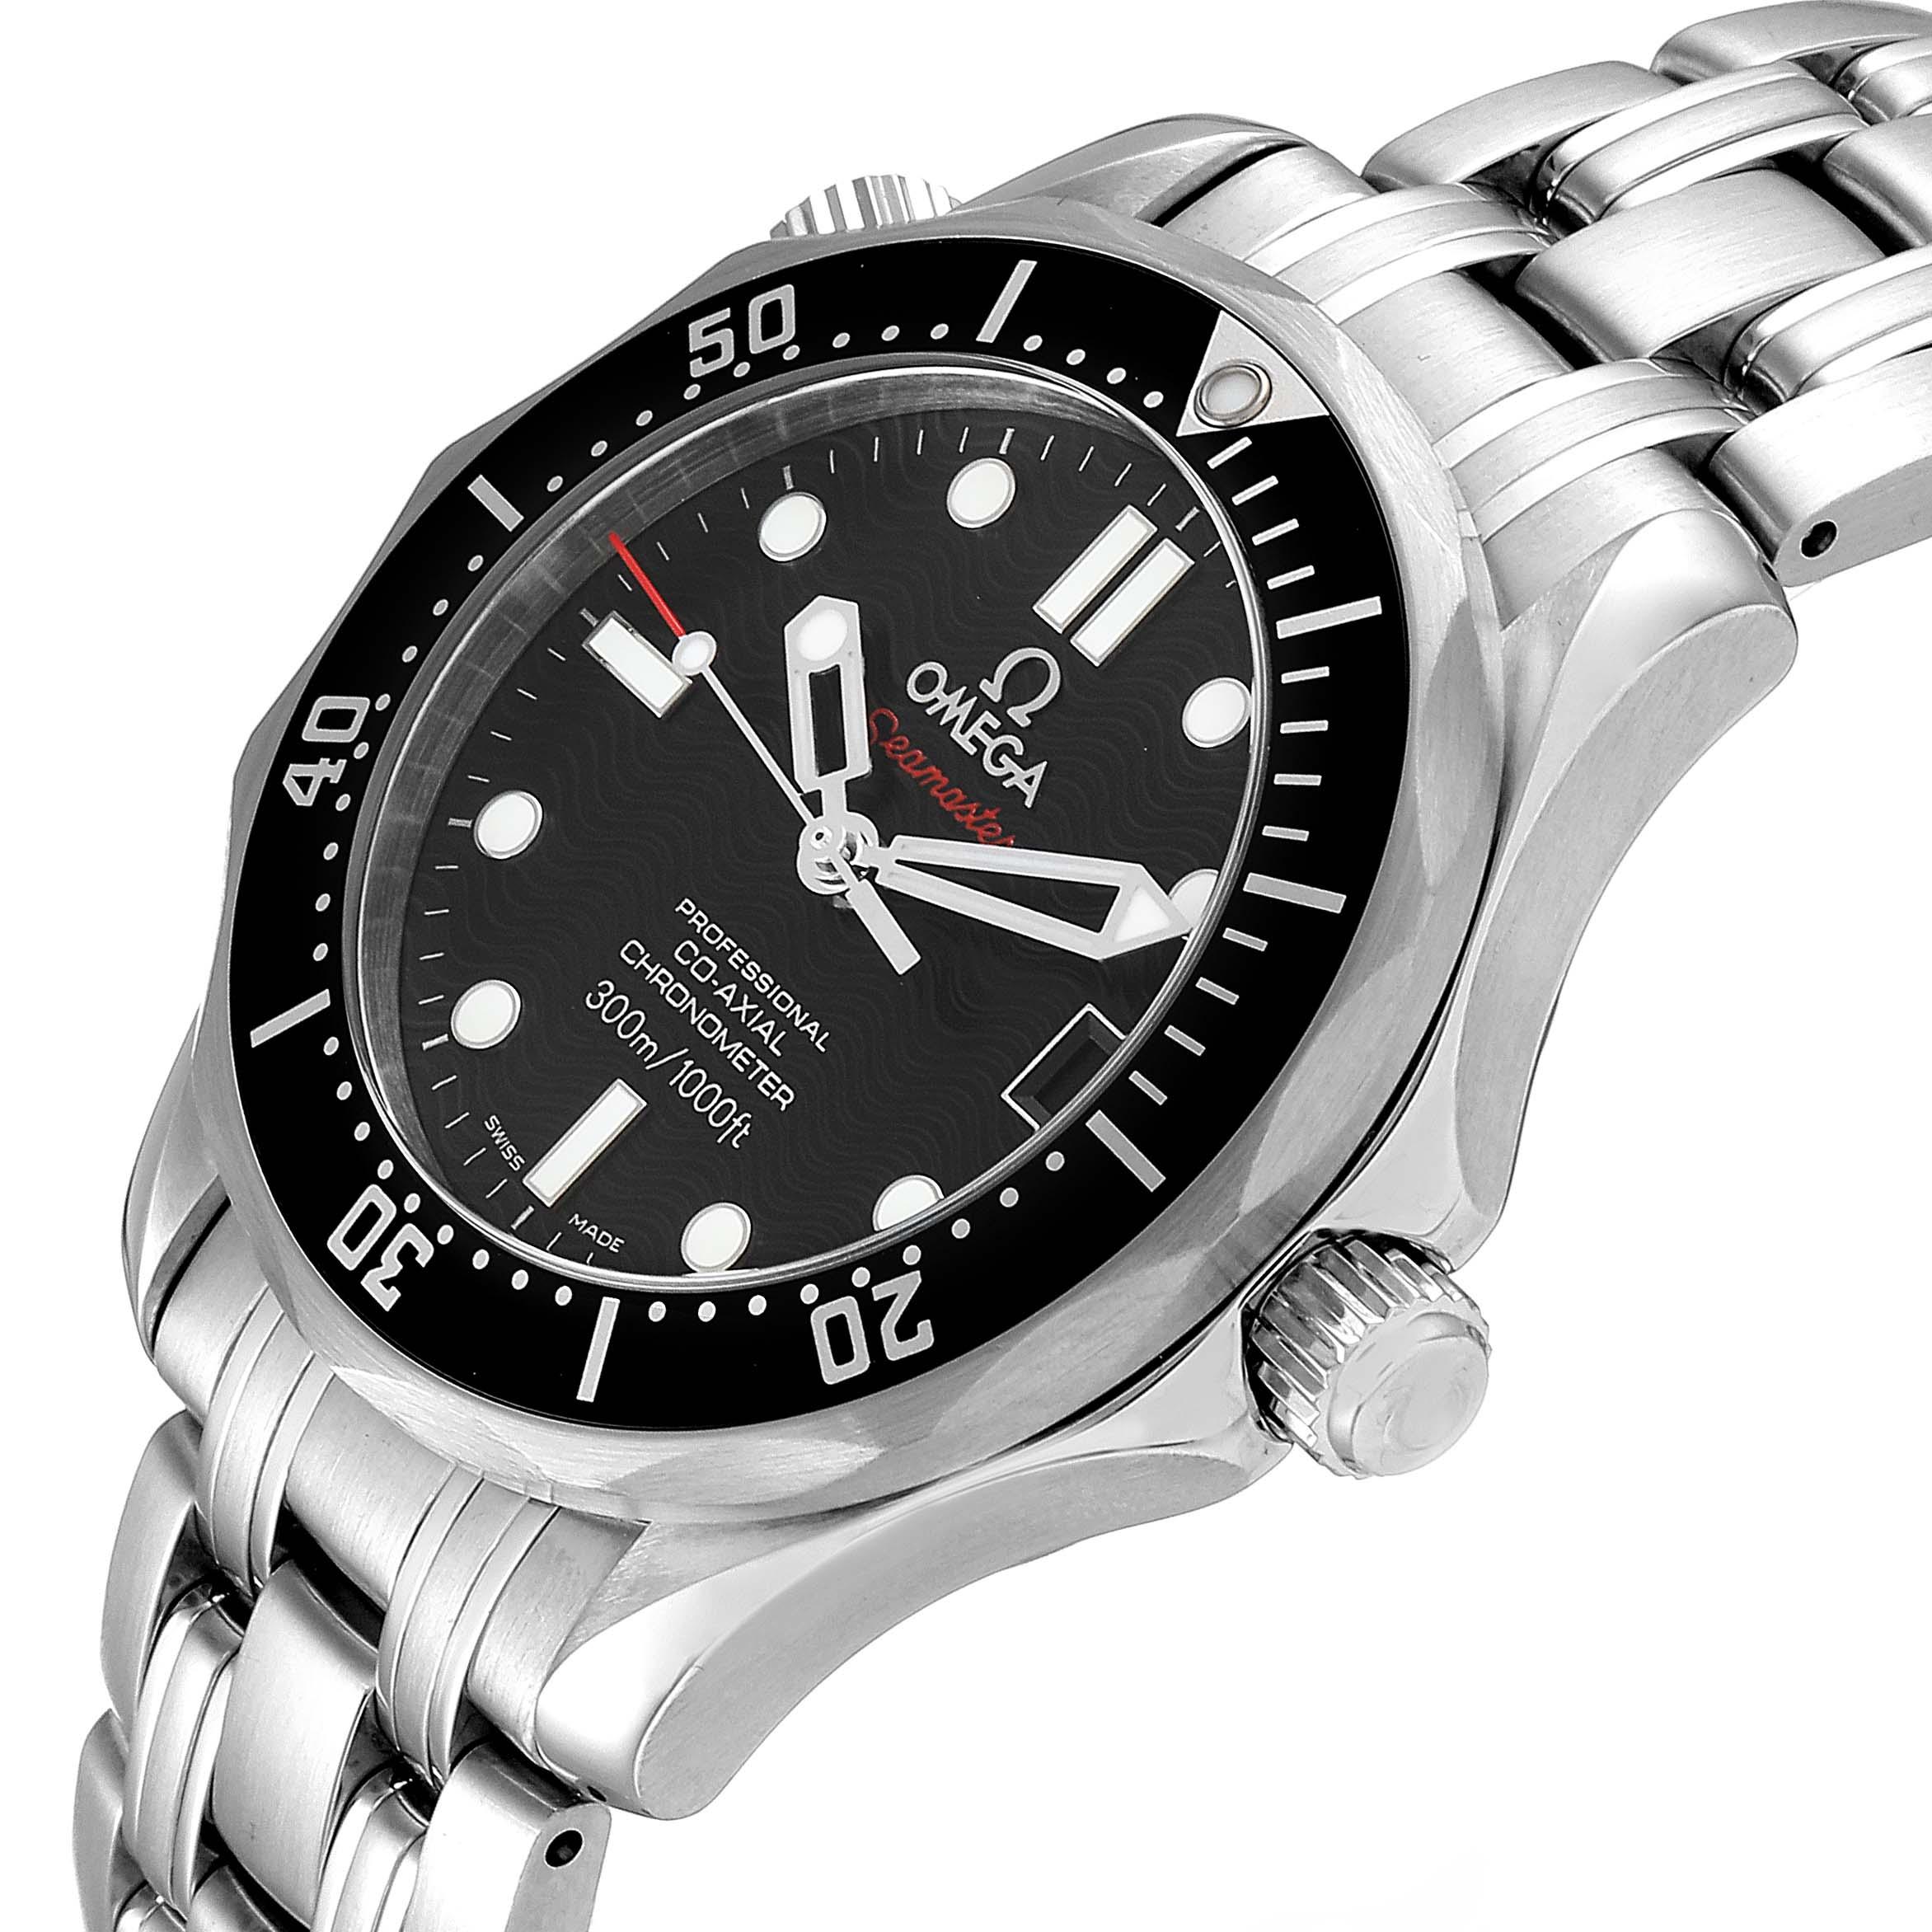 Omega Seamaster 300M Midsize 36 Mens Watch 212.30.36.20.01.001 Box Card SwissWatchExpo